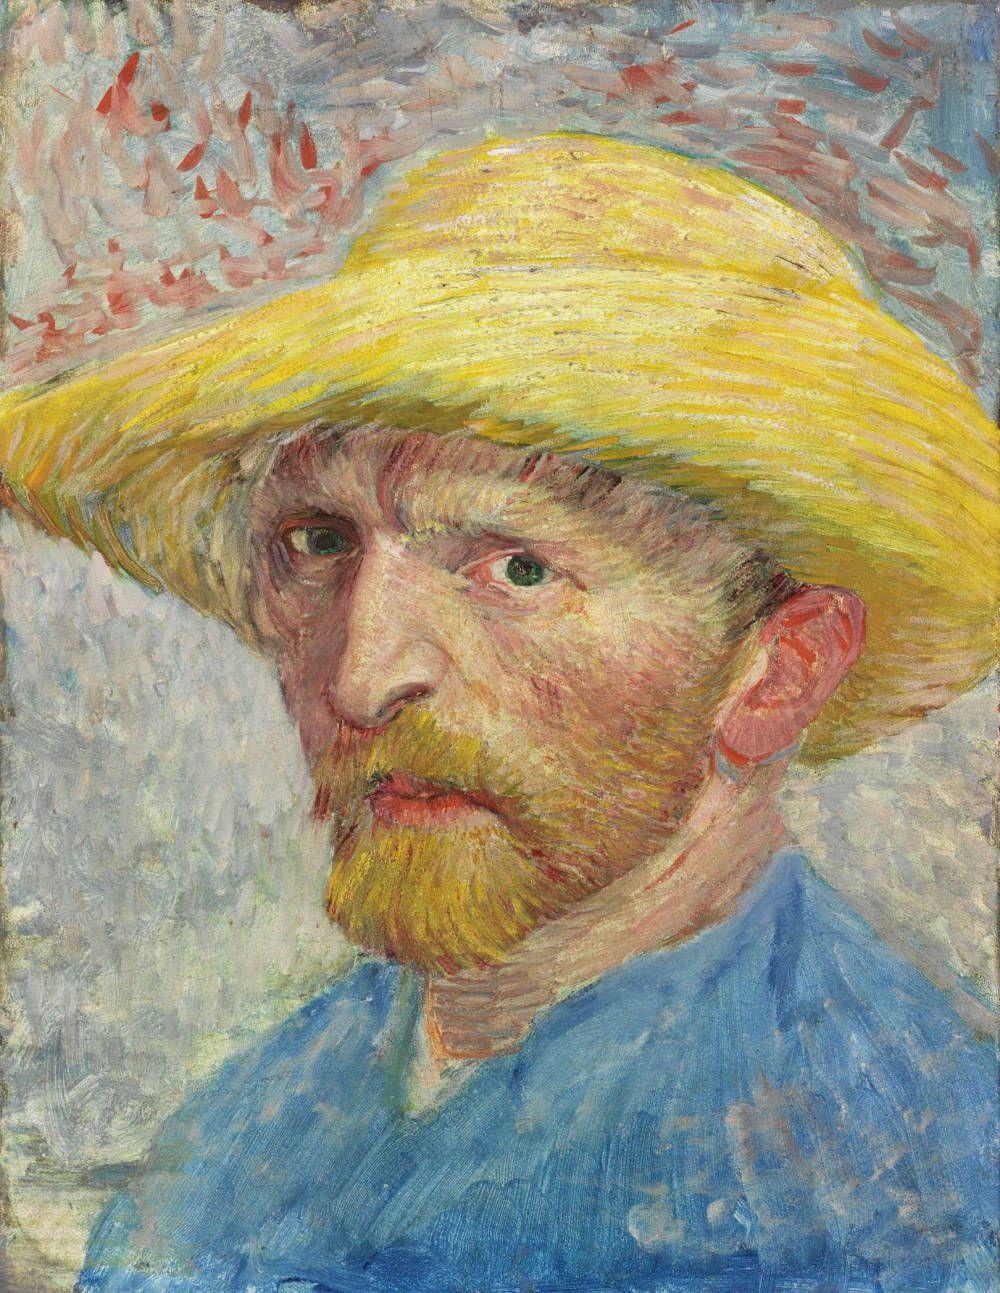 Van Gogh Vincent/'s Chair 10 x 8 Inch Mounted Art Print